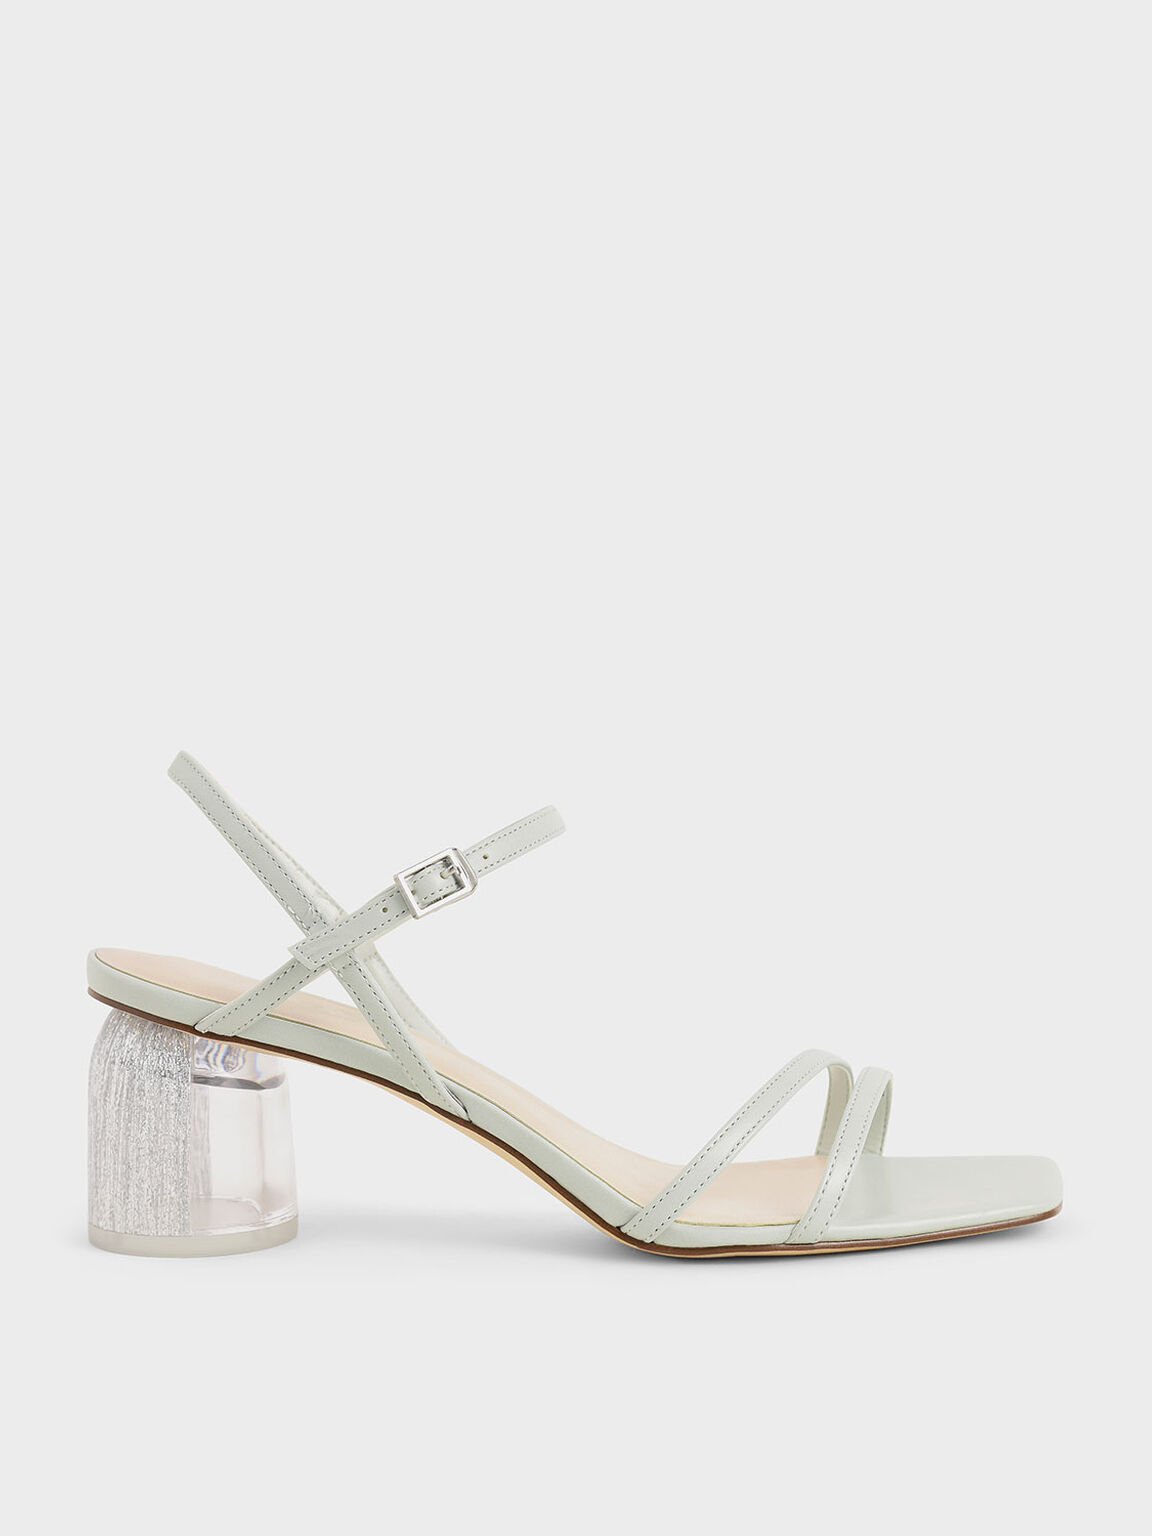 Strappy Sculptural Heel Sandals, Light Grey, hi-res